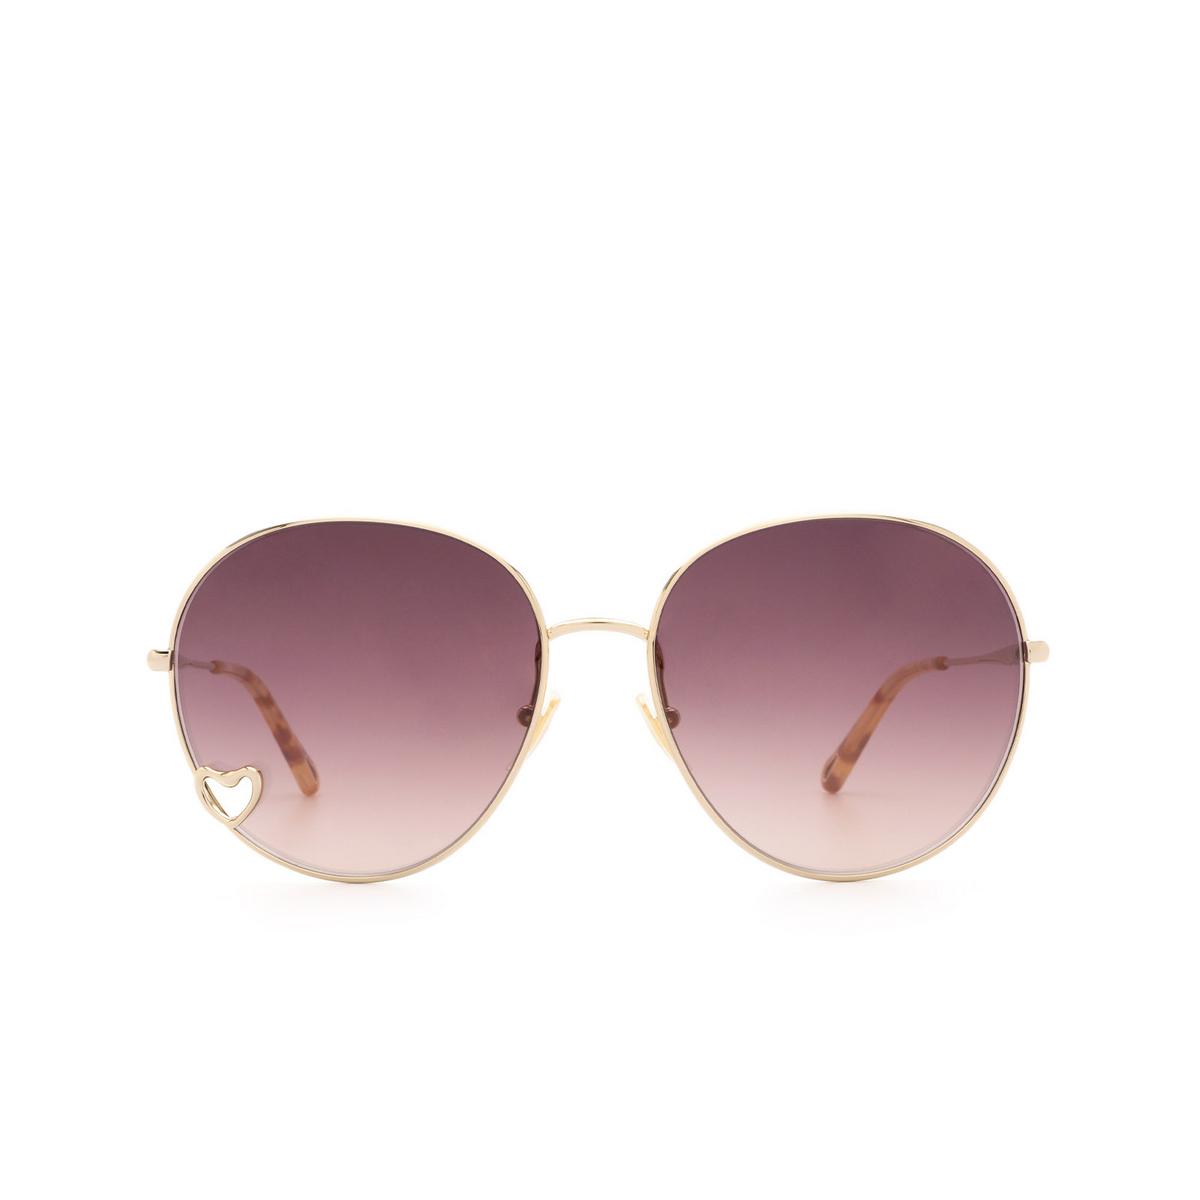 Chloé ® Round Sunglasses: CH0027S color Gold 001.